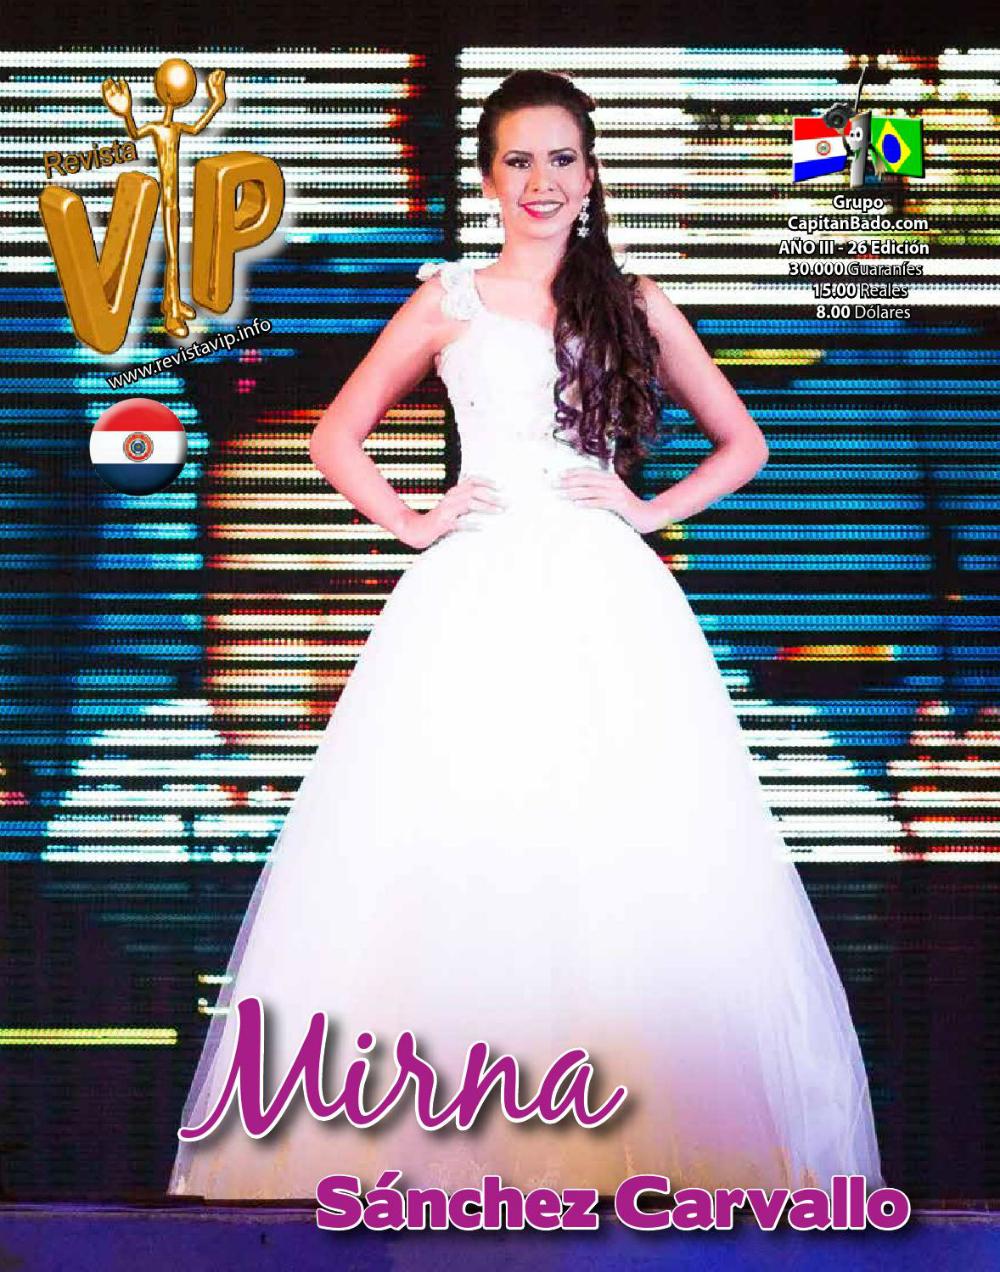 Vip 26 Paraguay